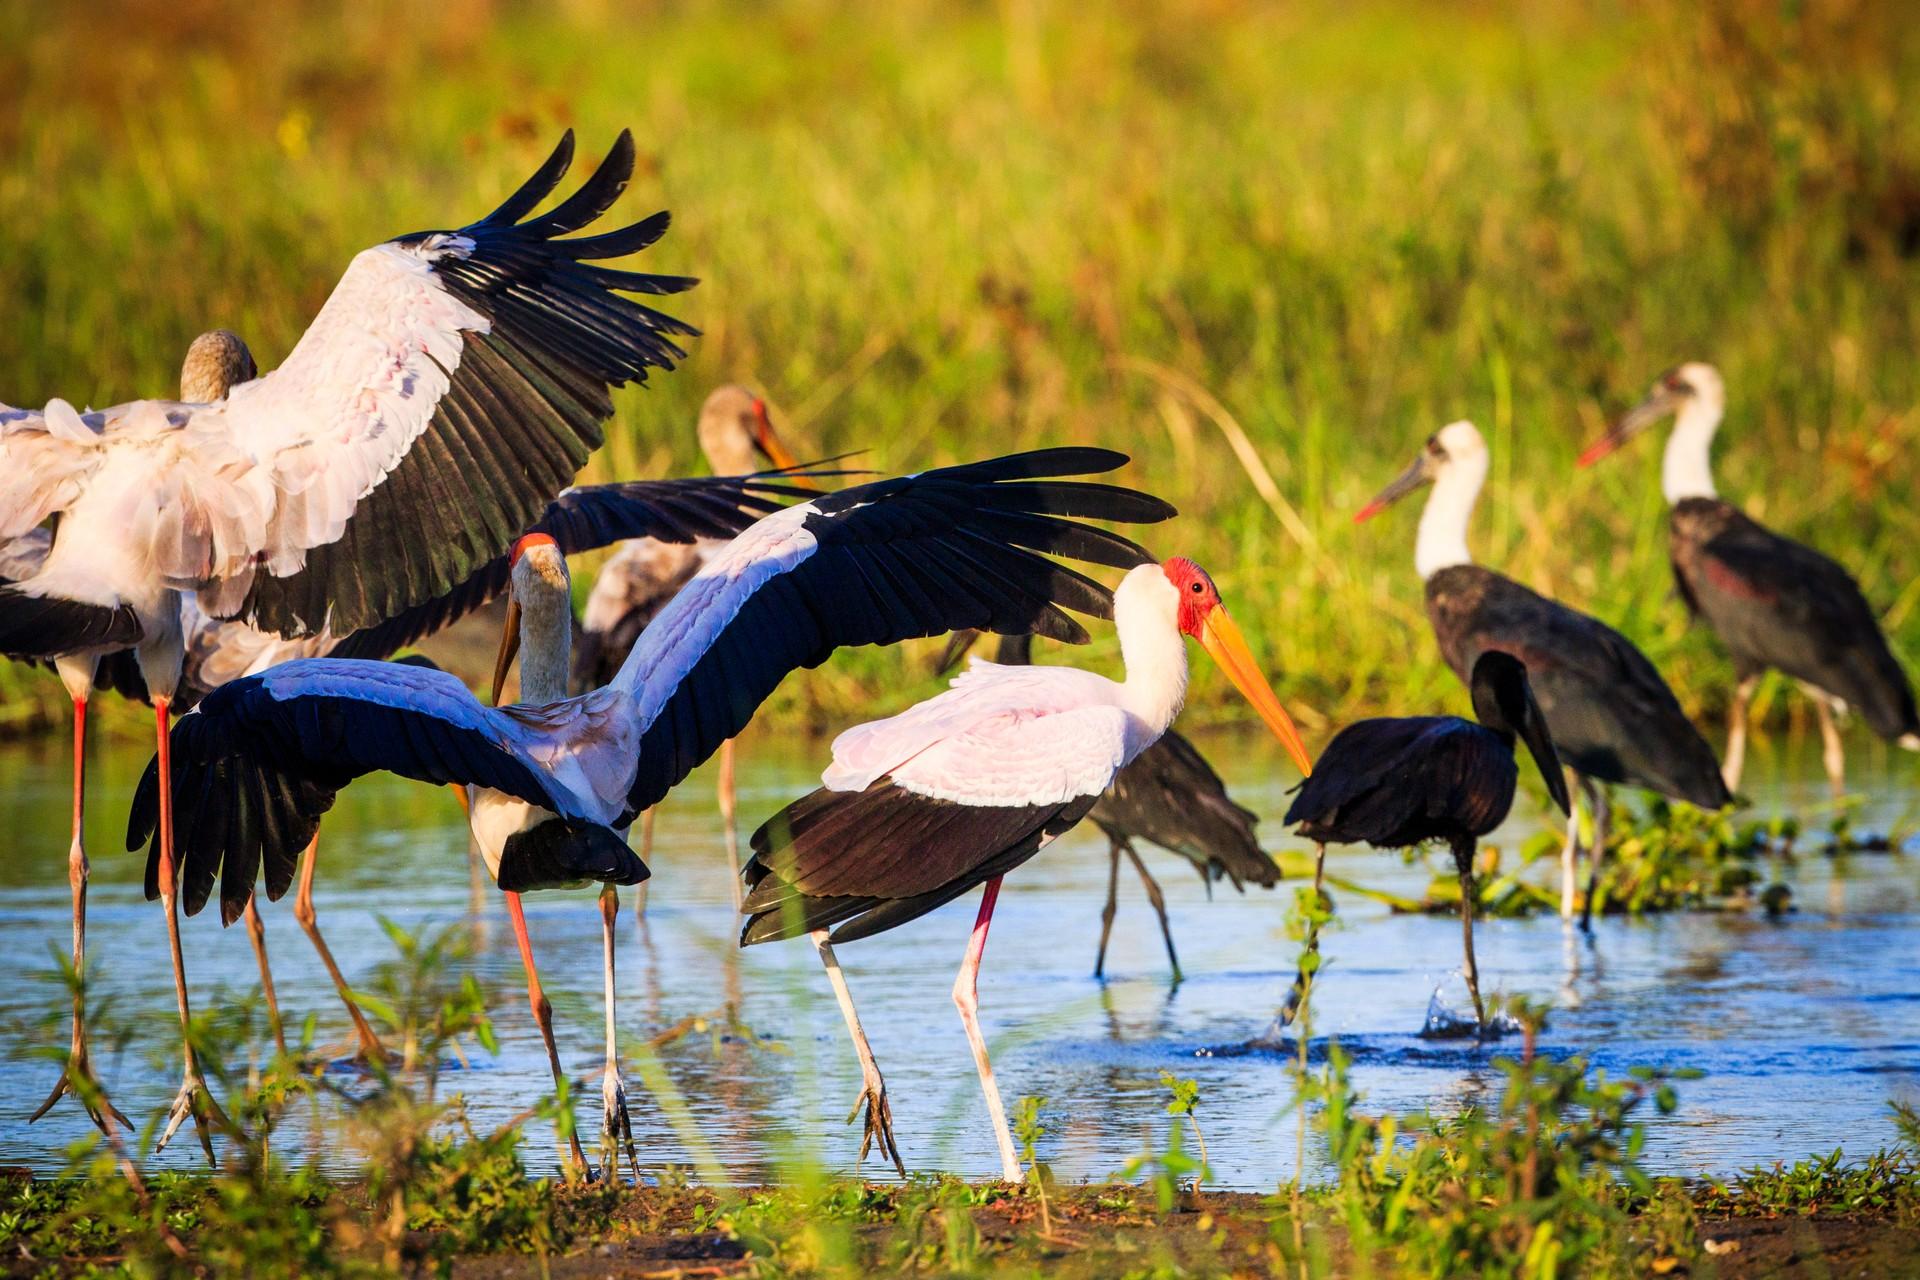 Yellow billed stork in Liwonde National Park, Malawi